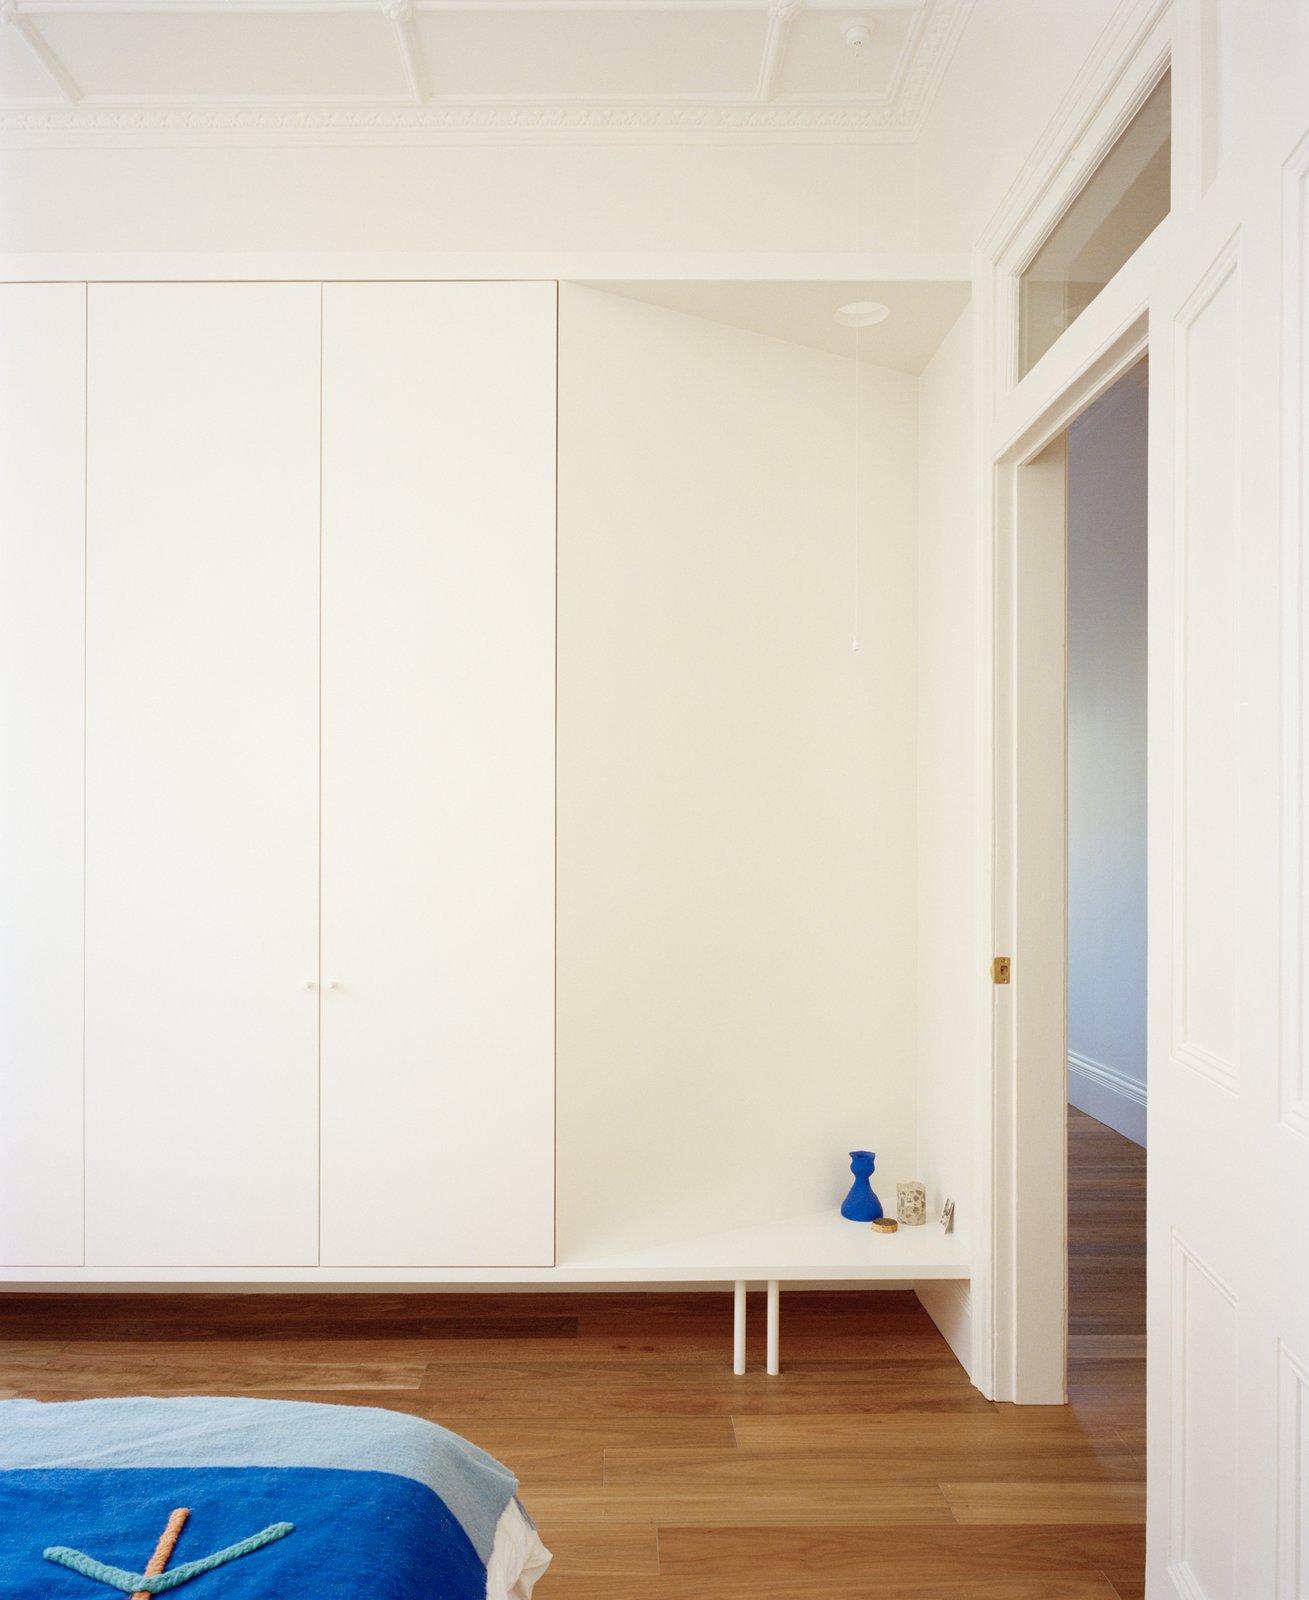 Bedroom in JJ House by Bokey Grant